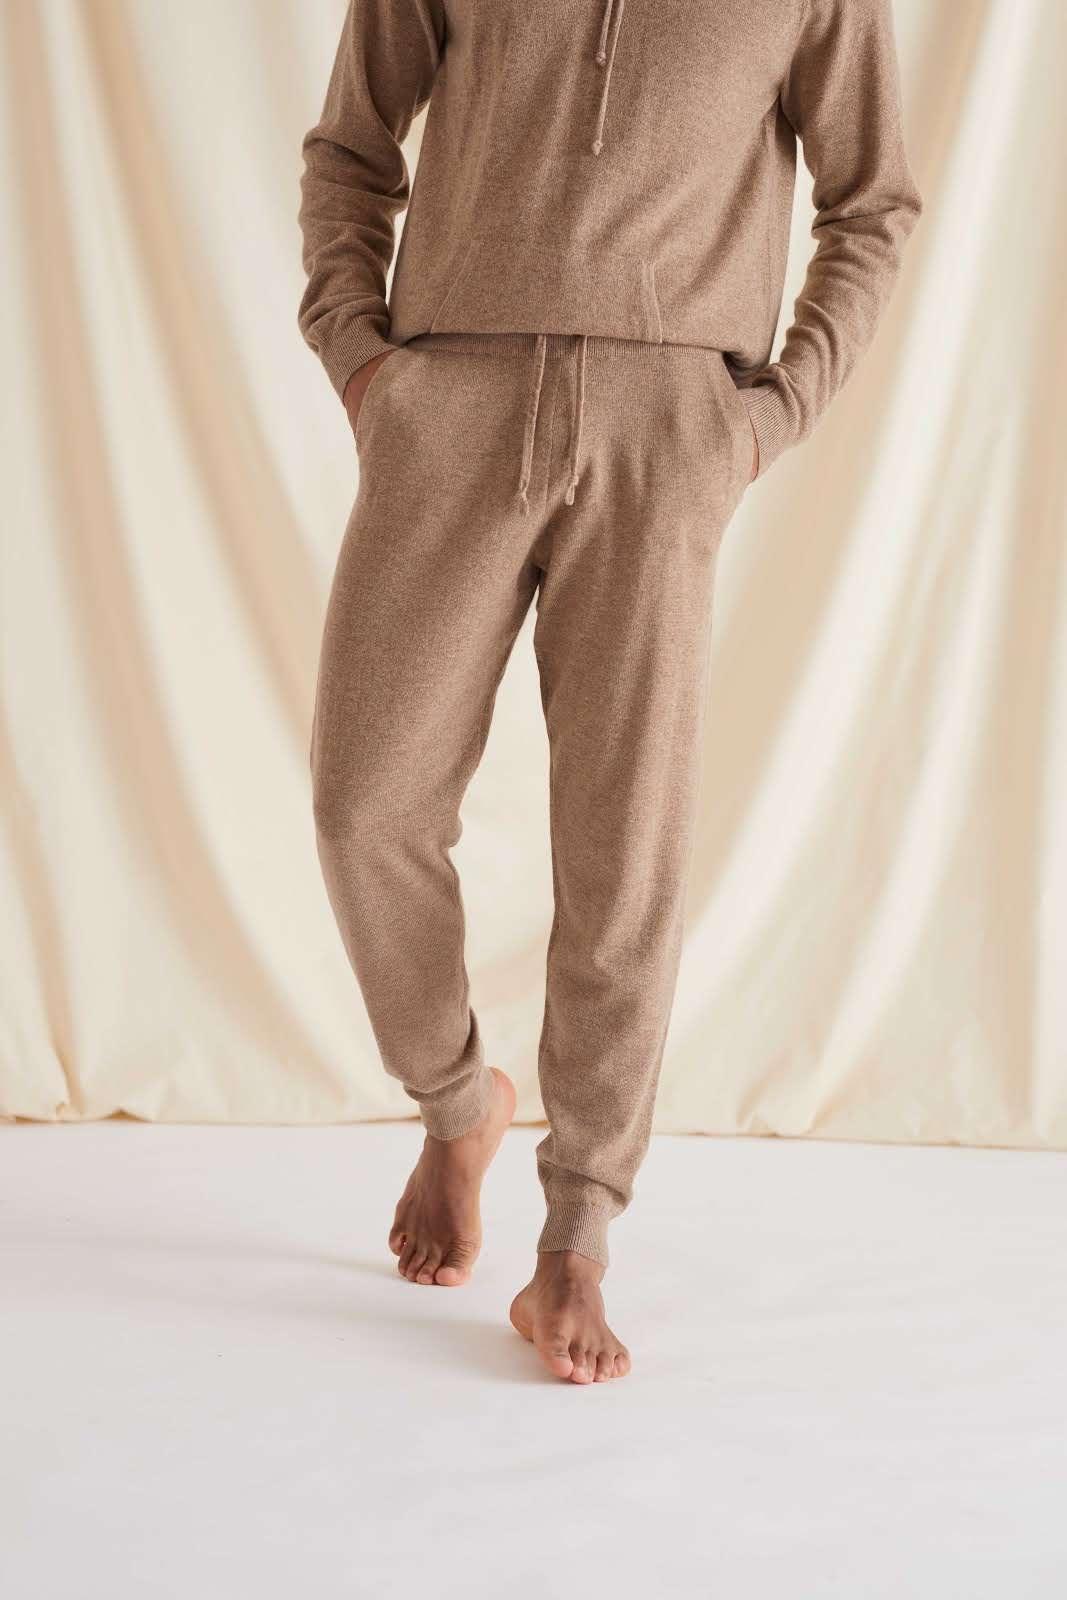 Man Pants Pockets